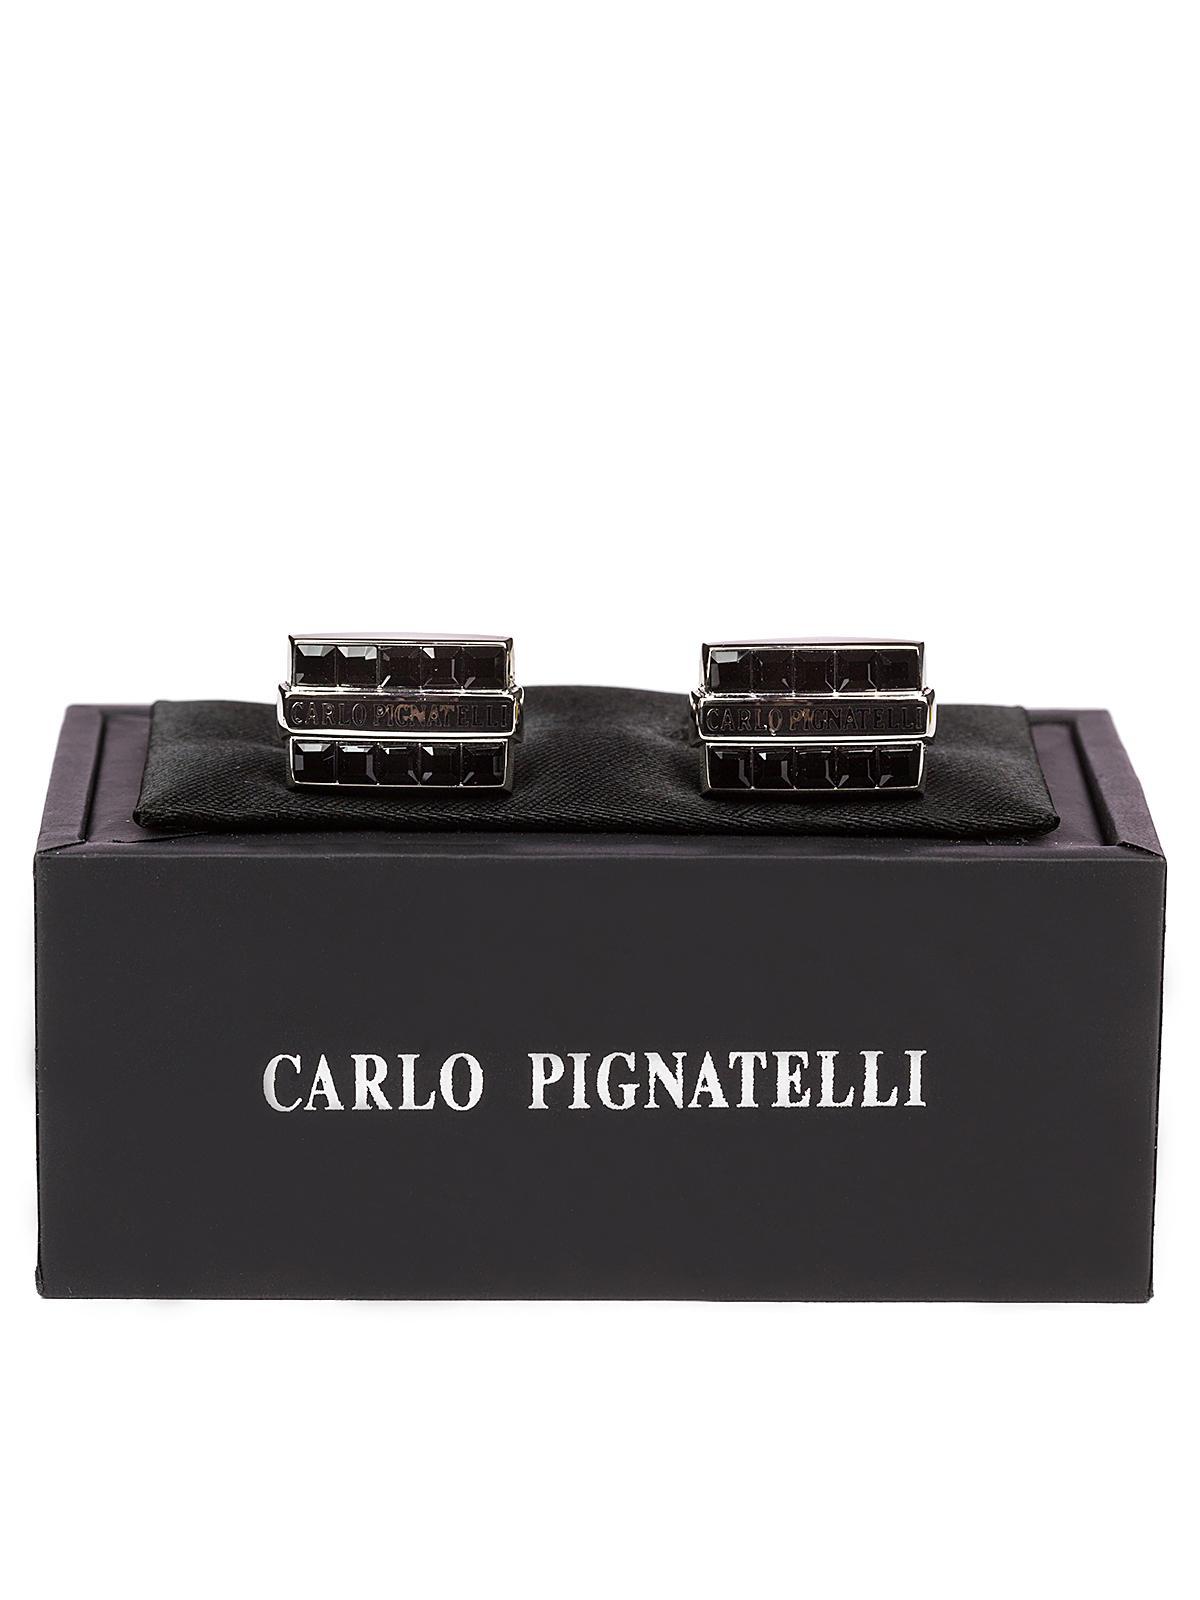 Carlo Pignatelli Gemelli AA6985